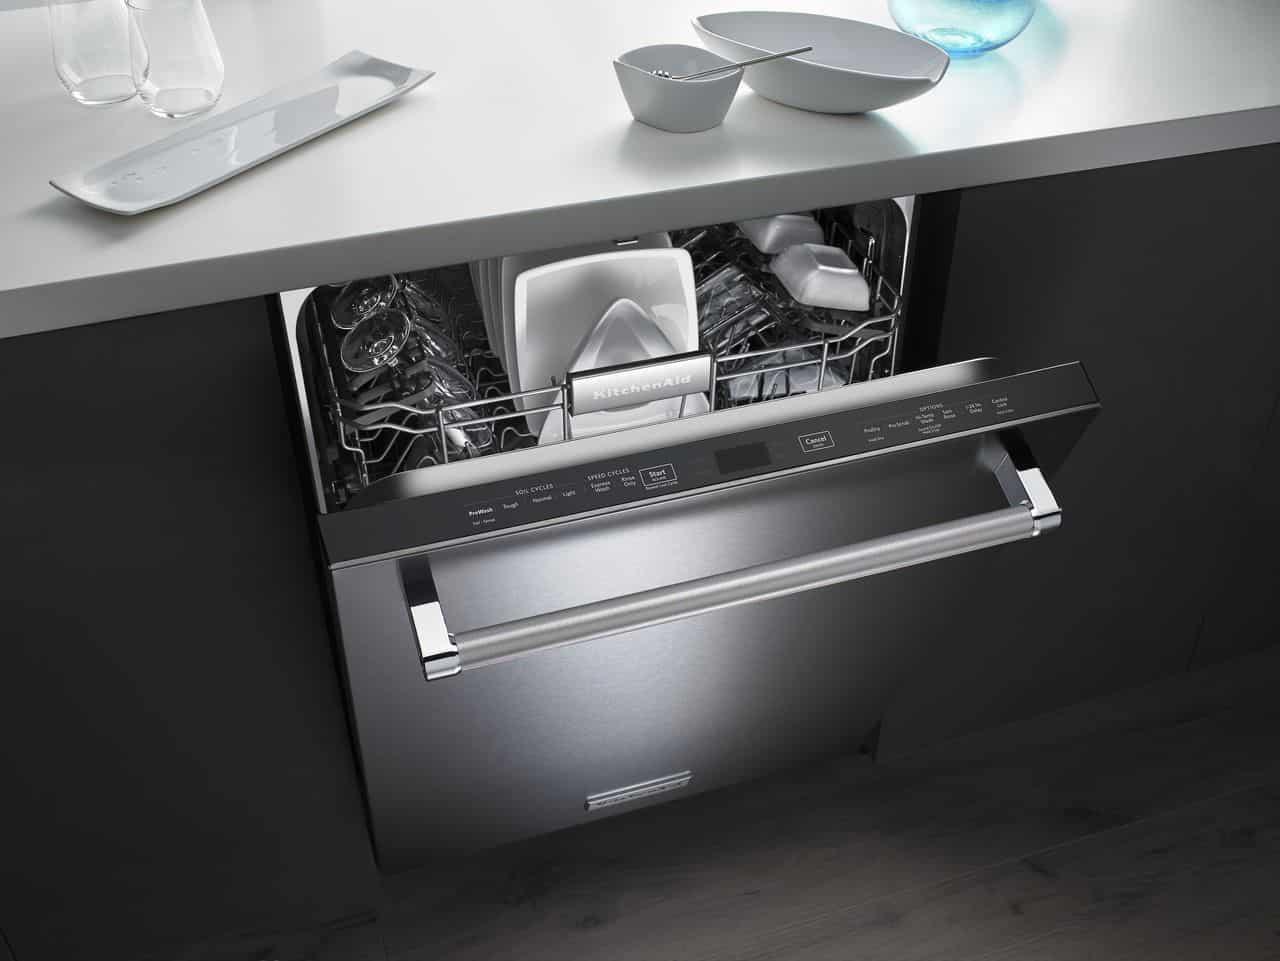 KitchenAid KDTM354ESS – best dishwasher